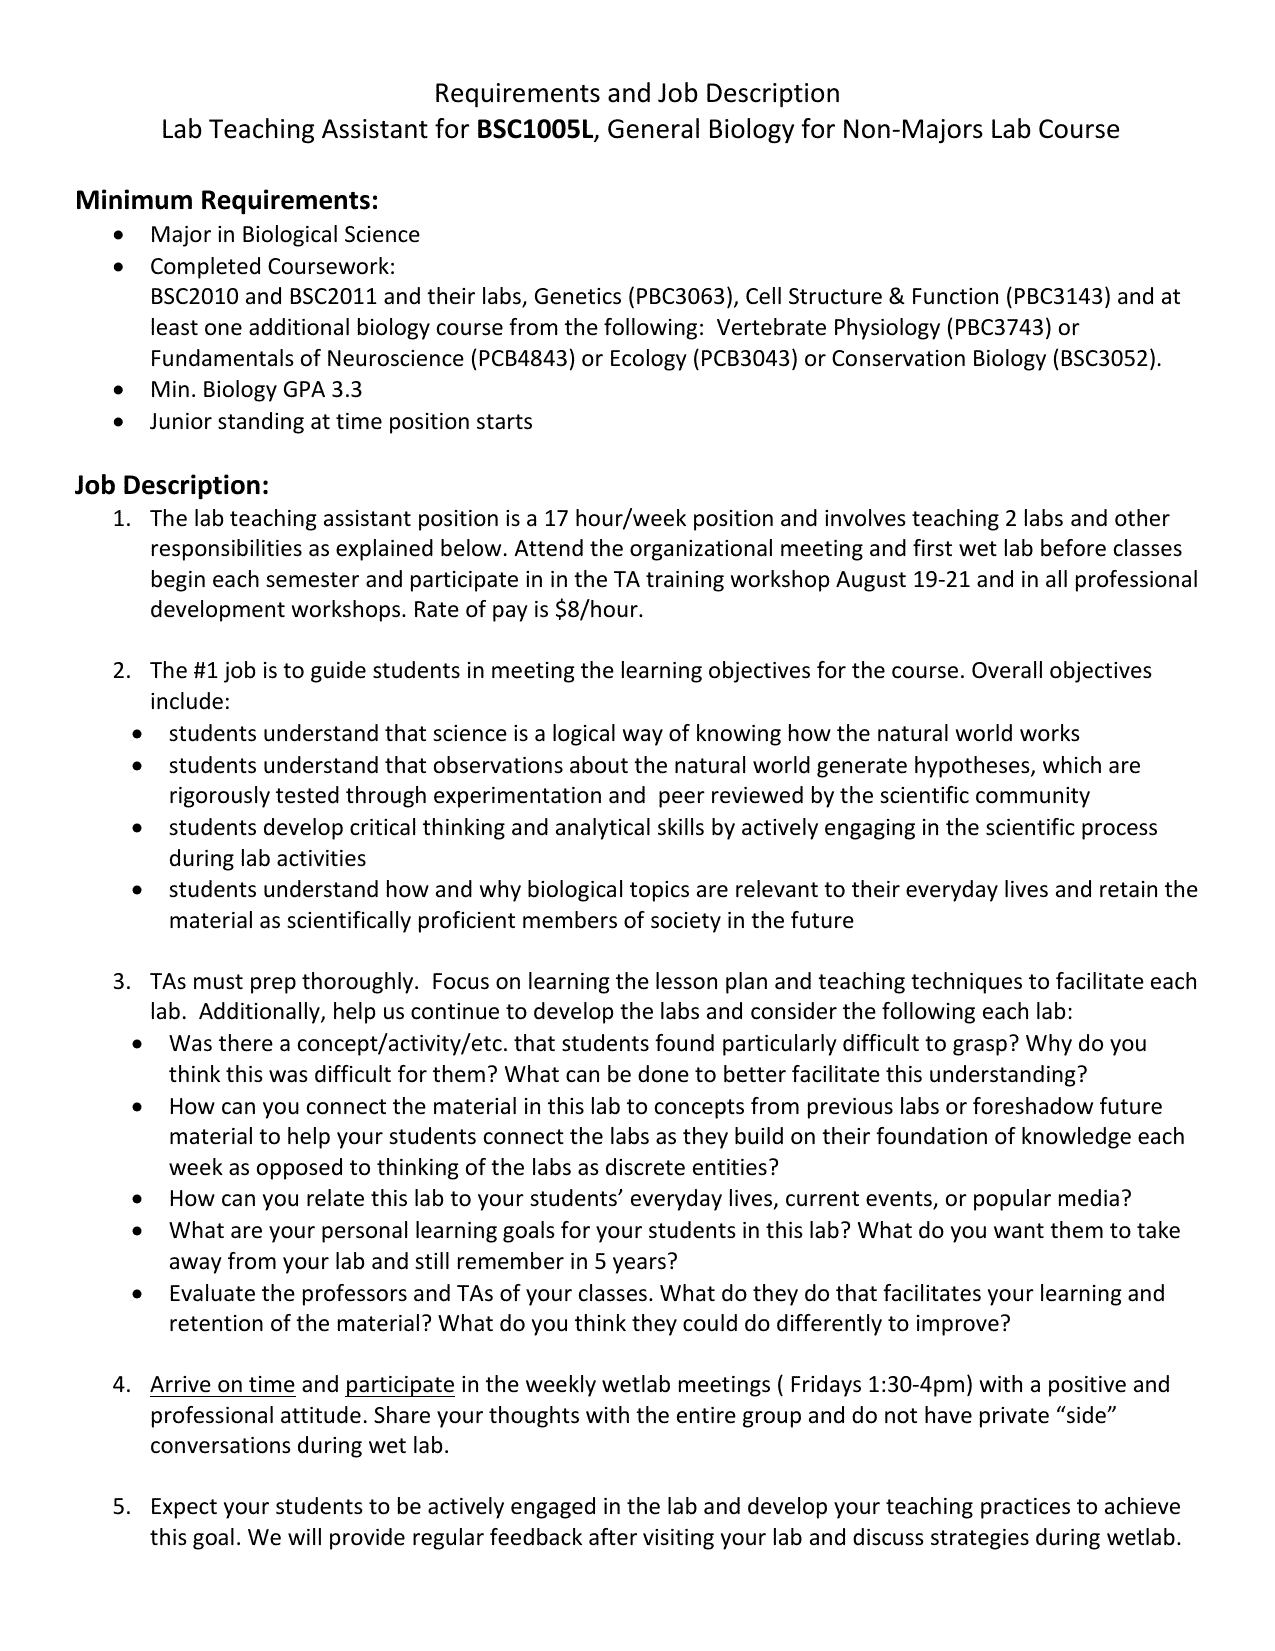 biological-scientist-job-responsibilities